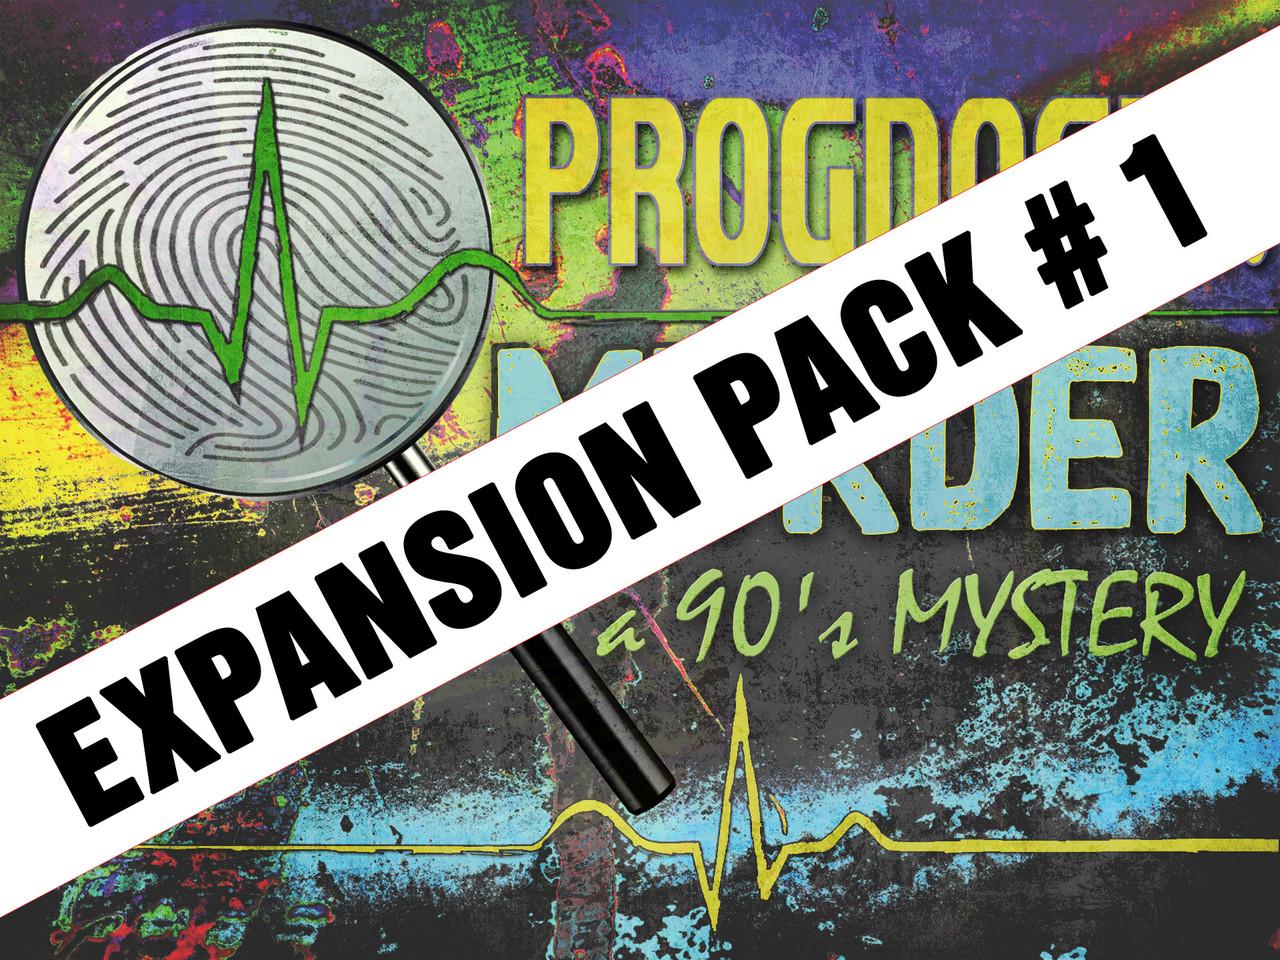 Prognosis Murder Expansion pack #1